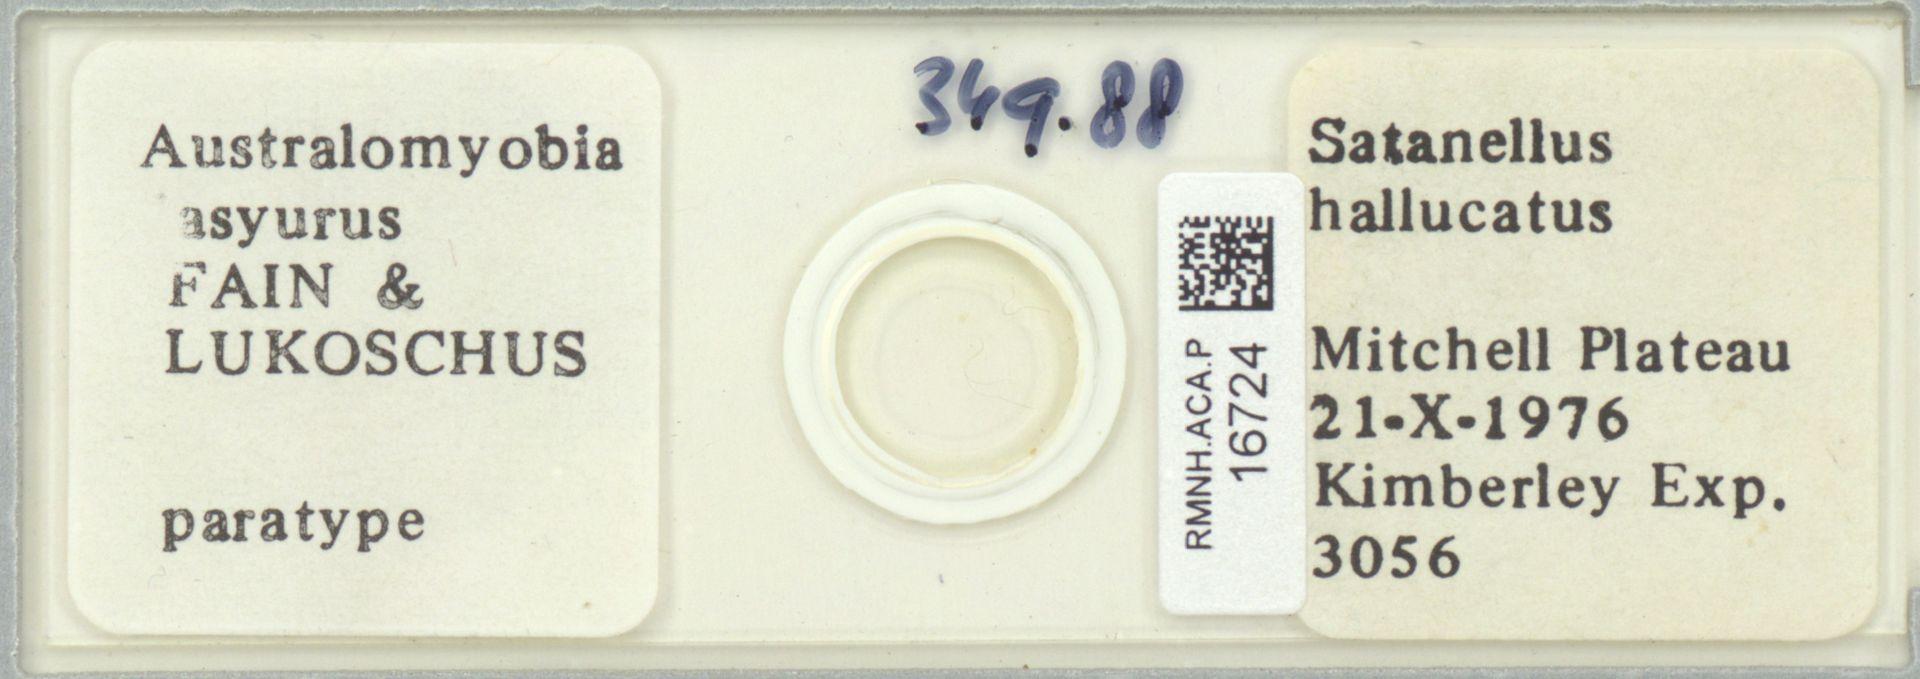 RMNH.ACA.P.16724 | Australomyobia dasyurus